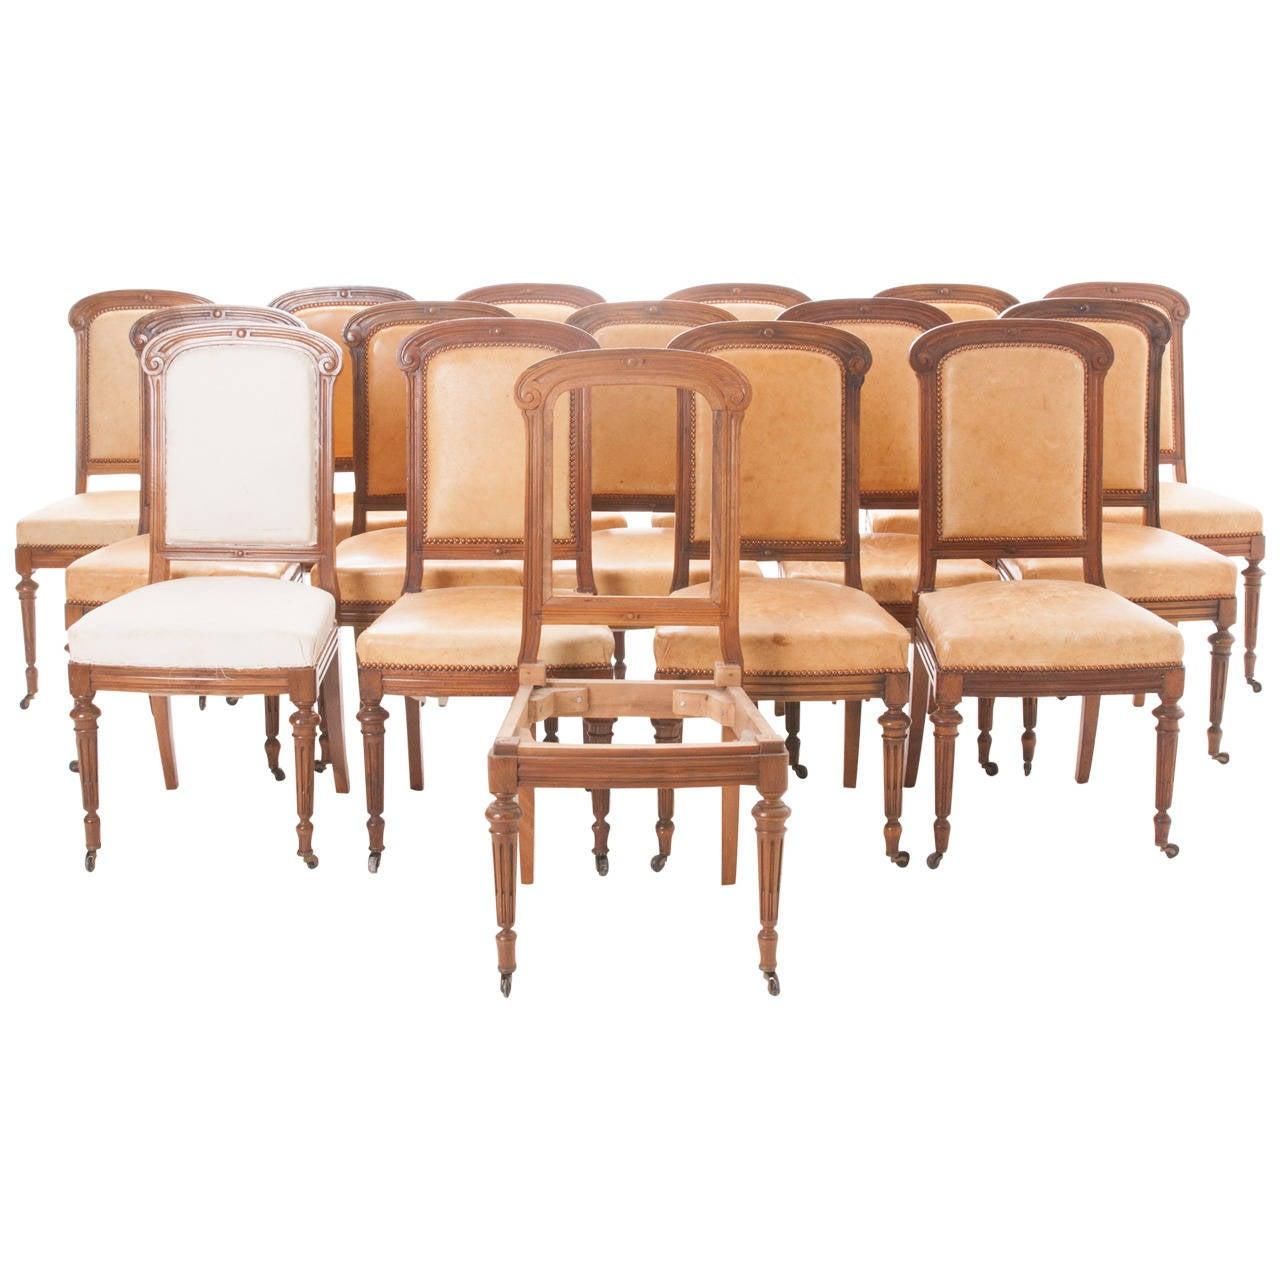 burl old chairs contemporary urban home ideas u2022 rh filezook com